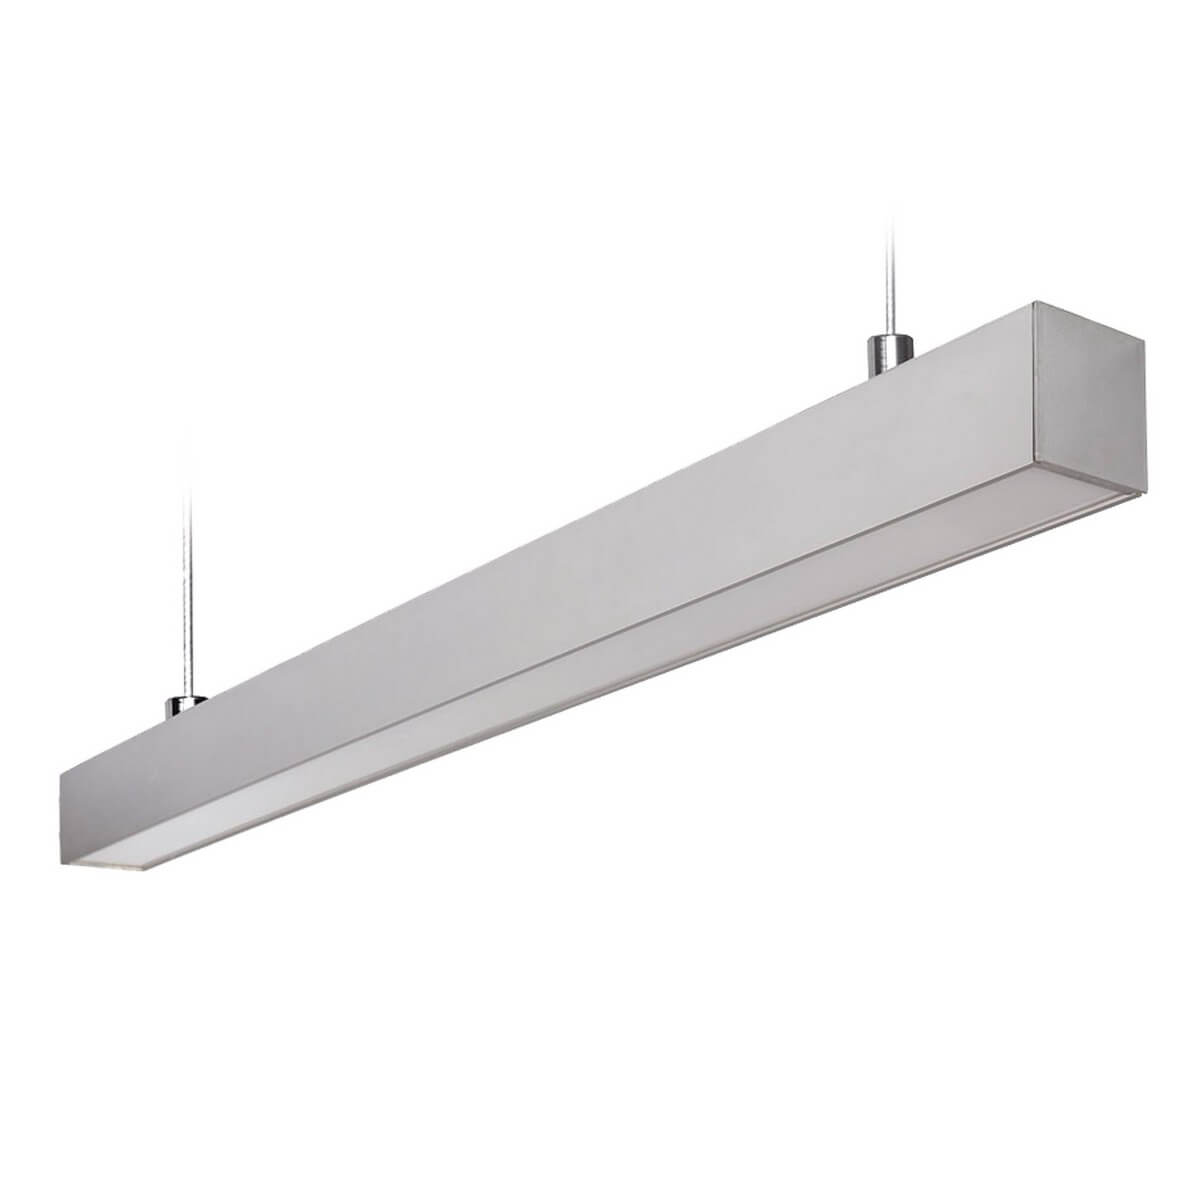 Подвесной светодиодный светильник (UL-00004208) Uniel ULO-K10D 60W/5000K/L120 IP65 Silver uniel ulo zl ulozl9050wnw